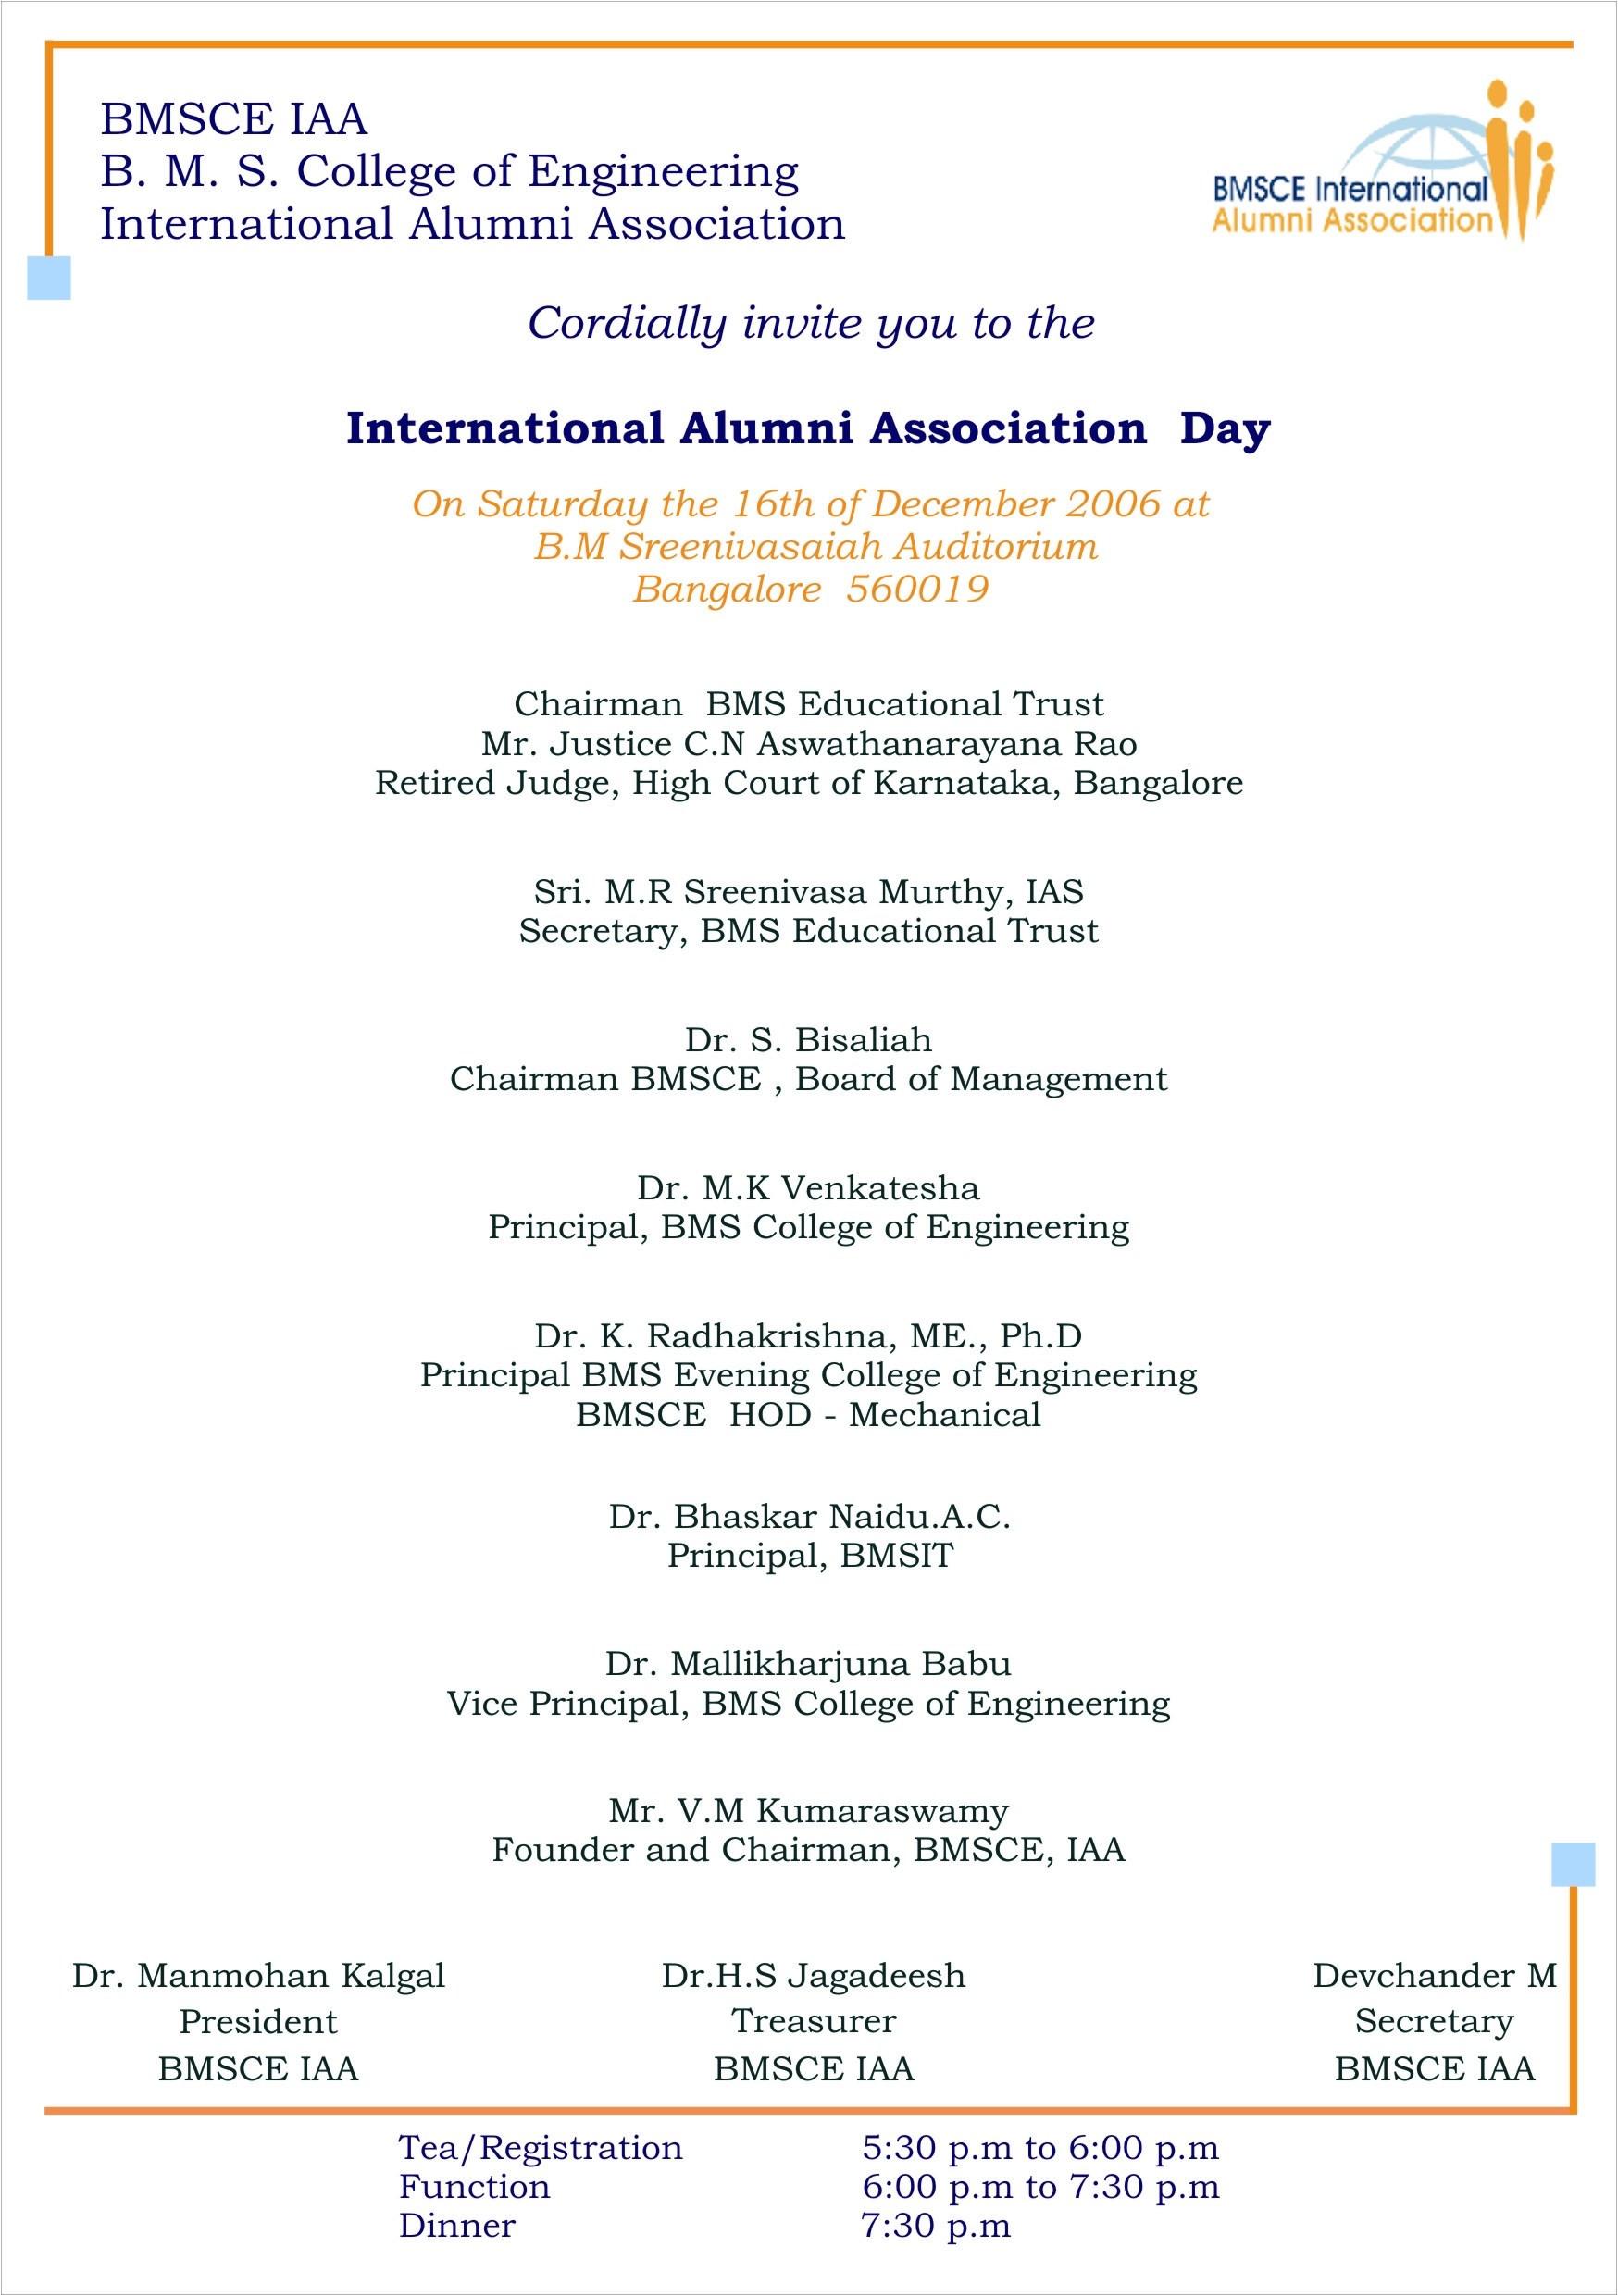 international alumni association day bmsce iaa function